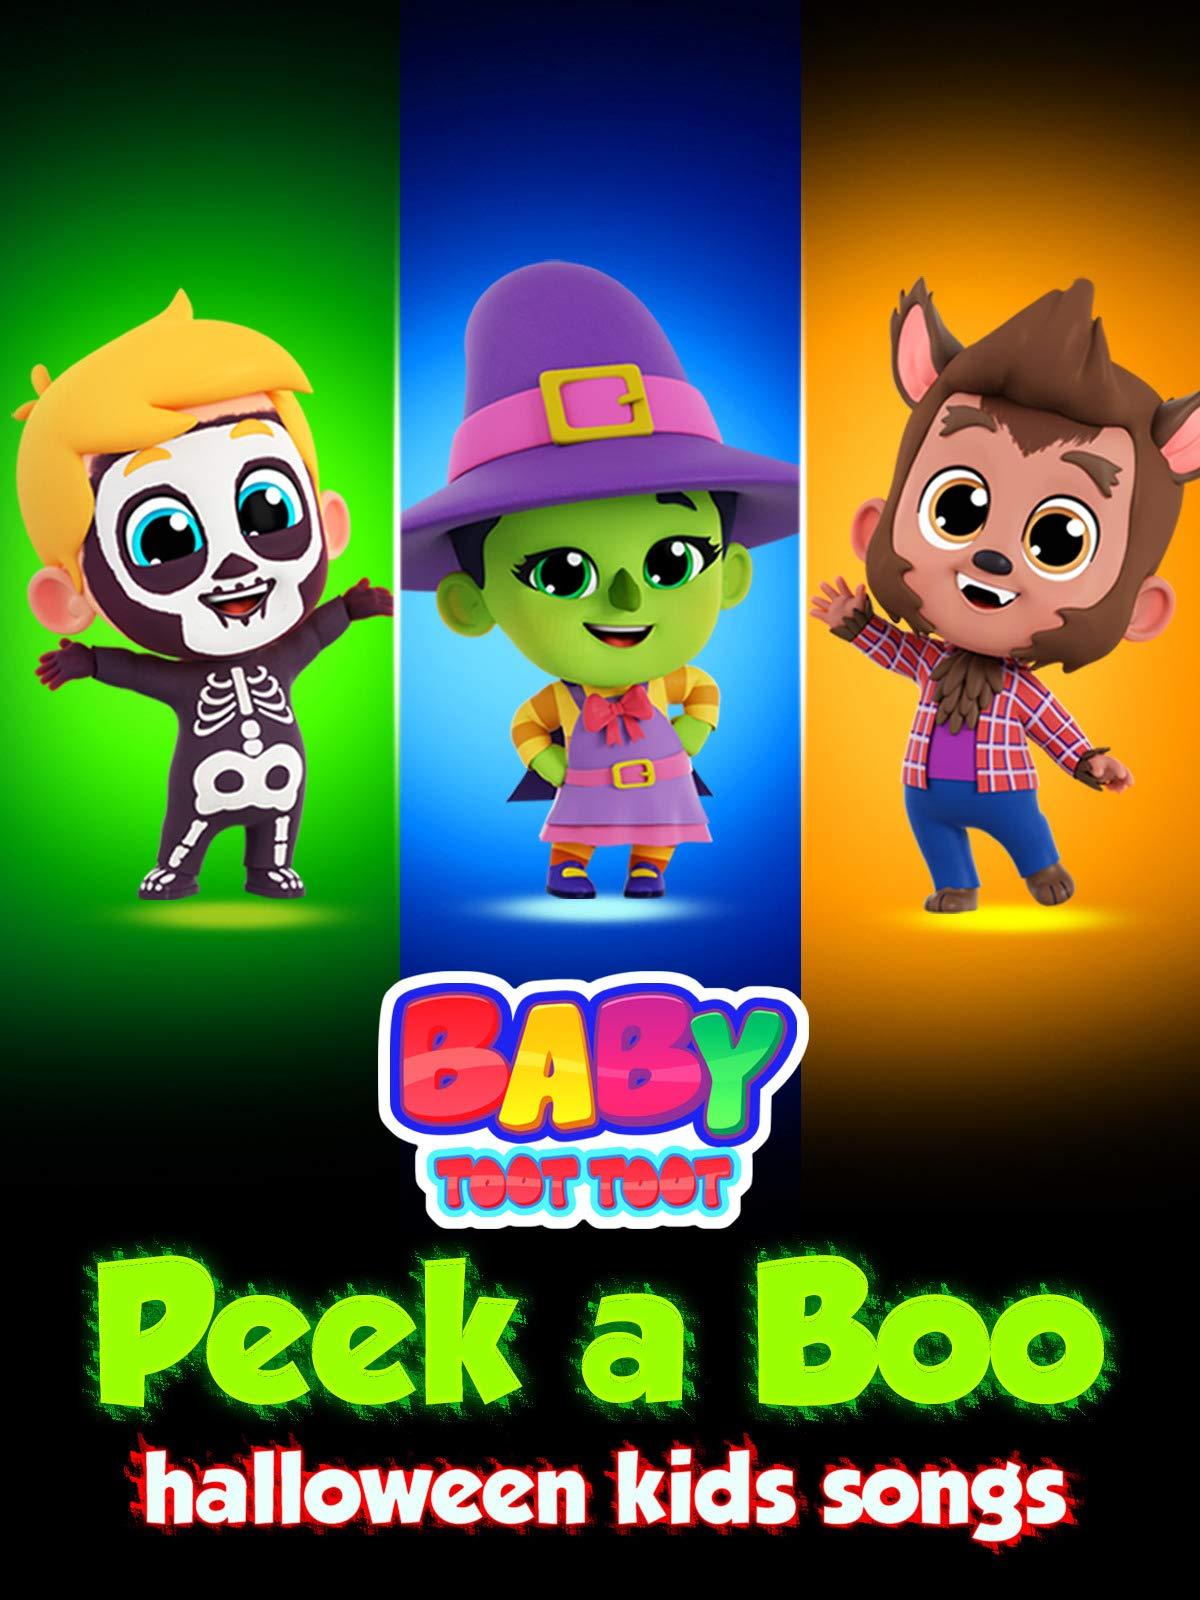 Peek a Boo Halloween Kids Songs - Baby Toot Toot on Amazon Prime Video UK